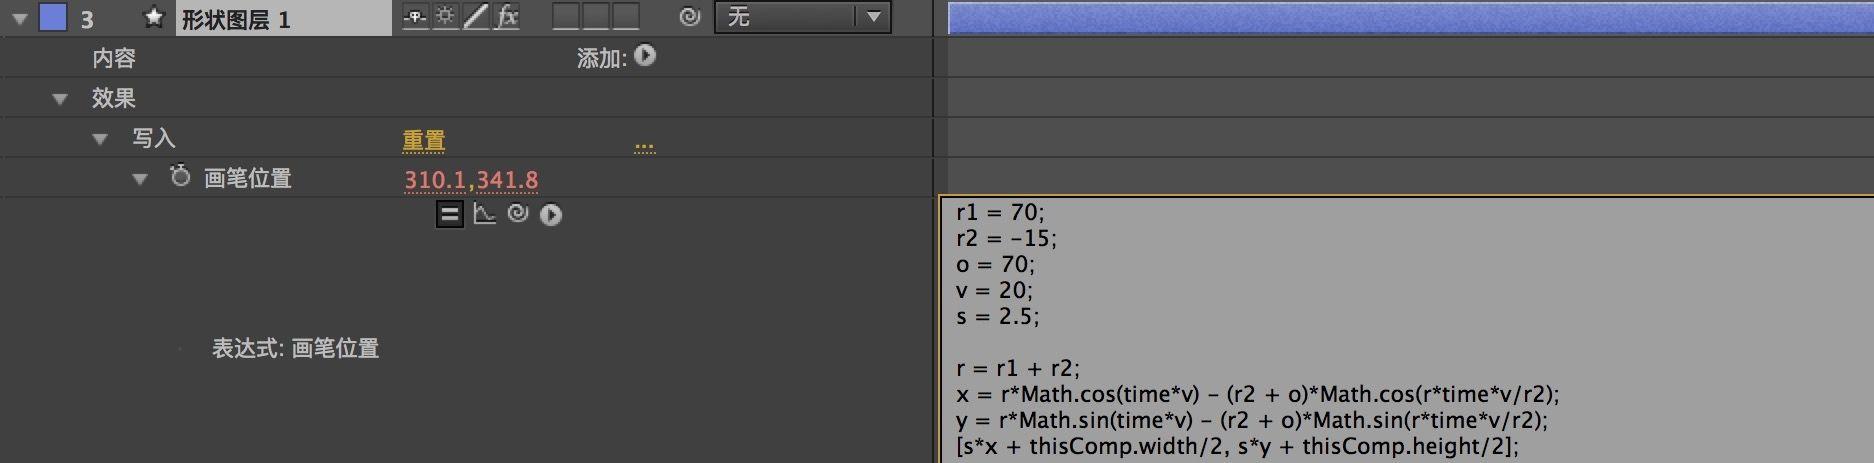 AE表达式绘制神秘图案(4)